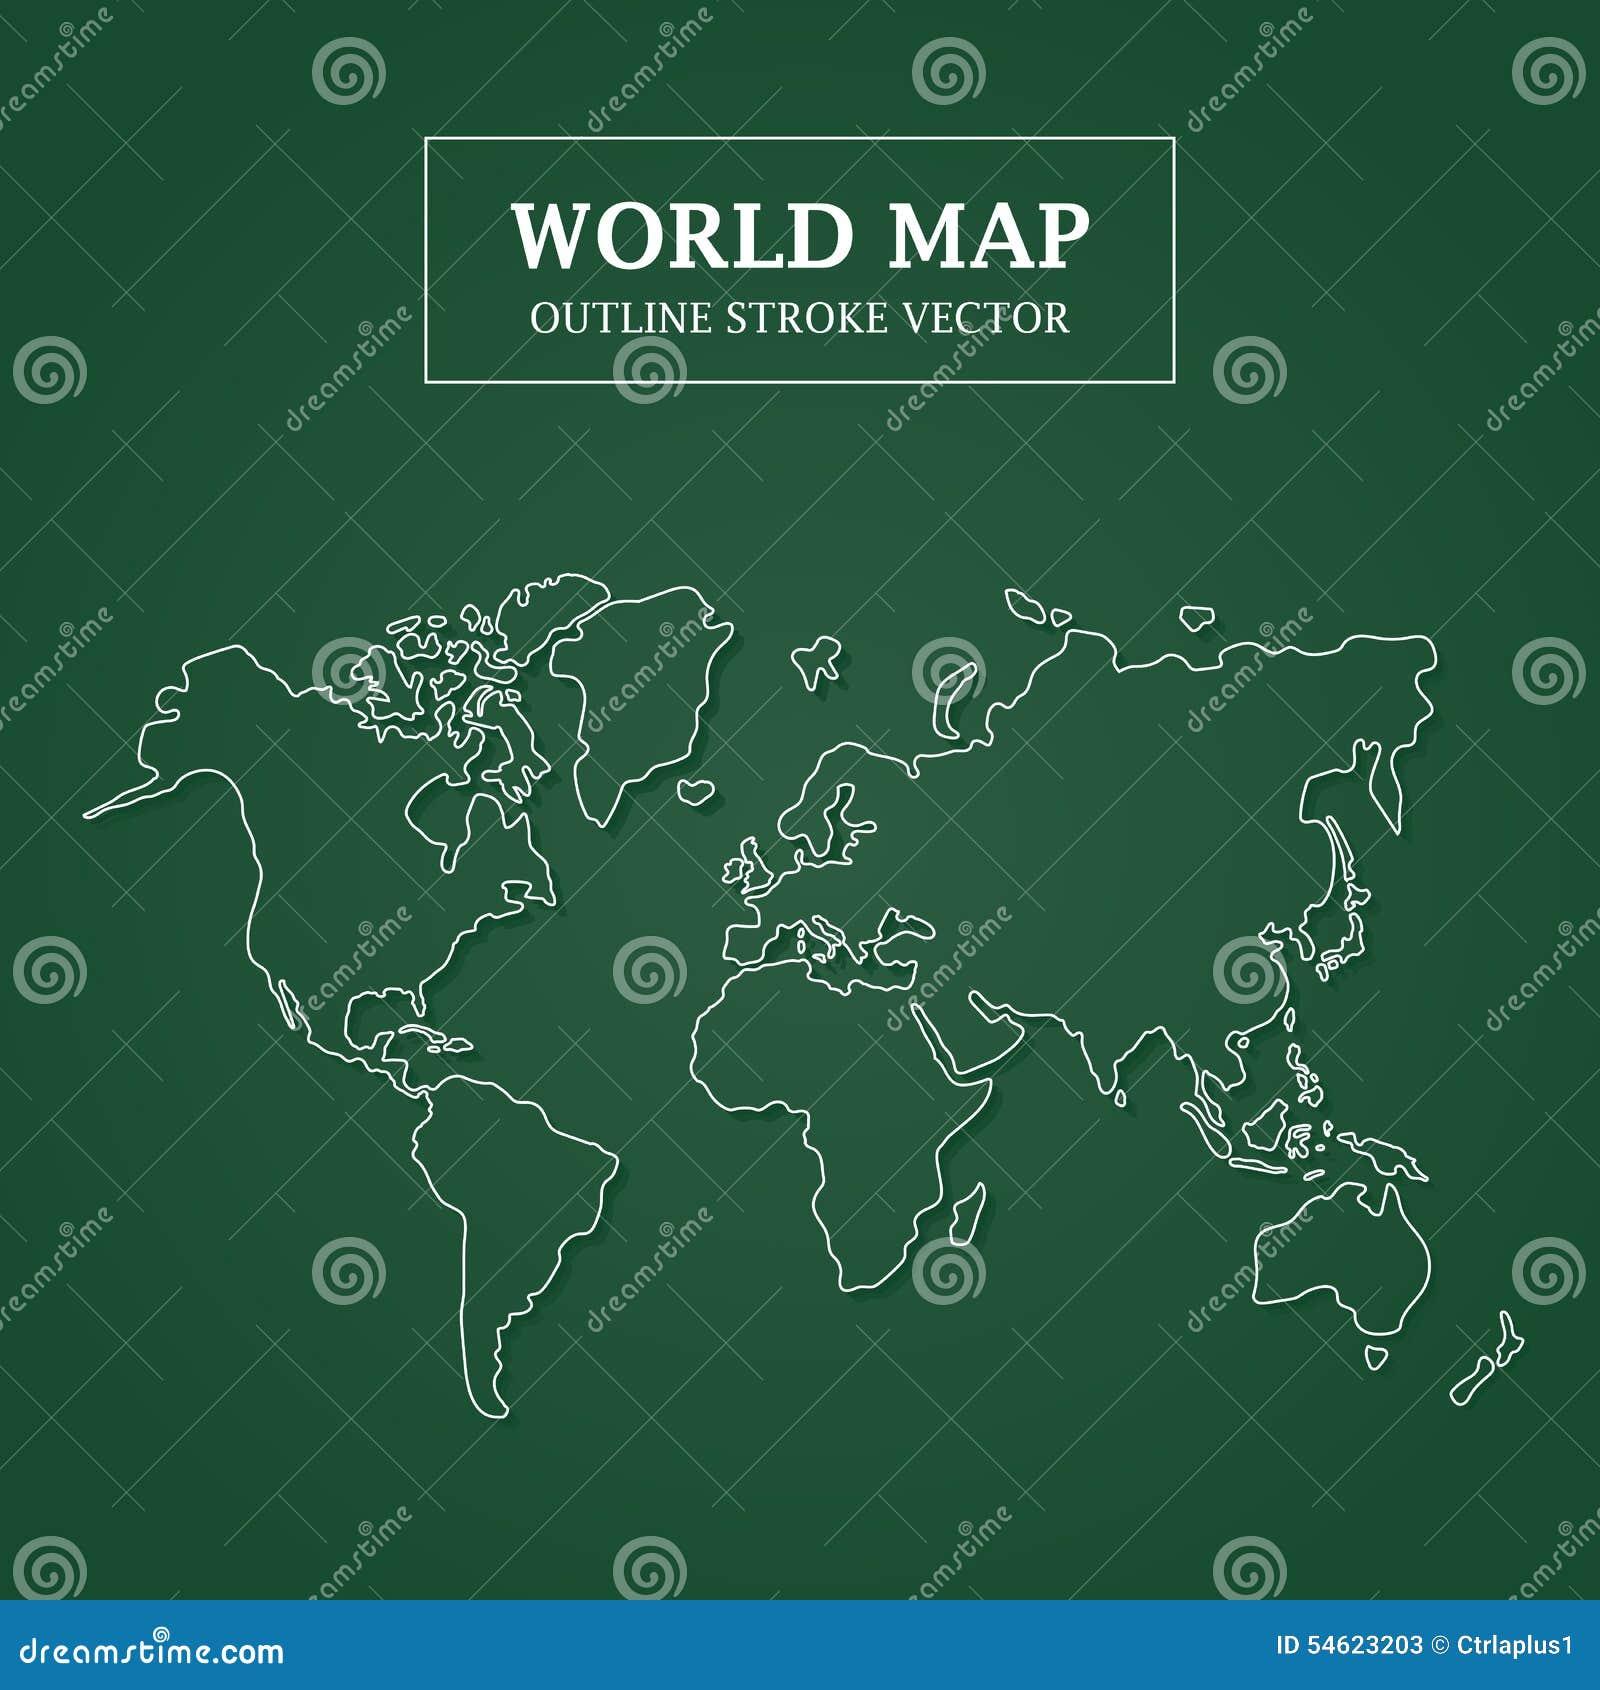 World Map White Outline Stroke on Green Background